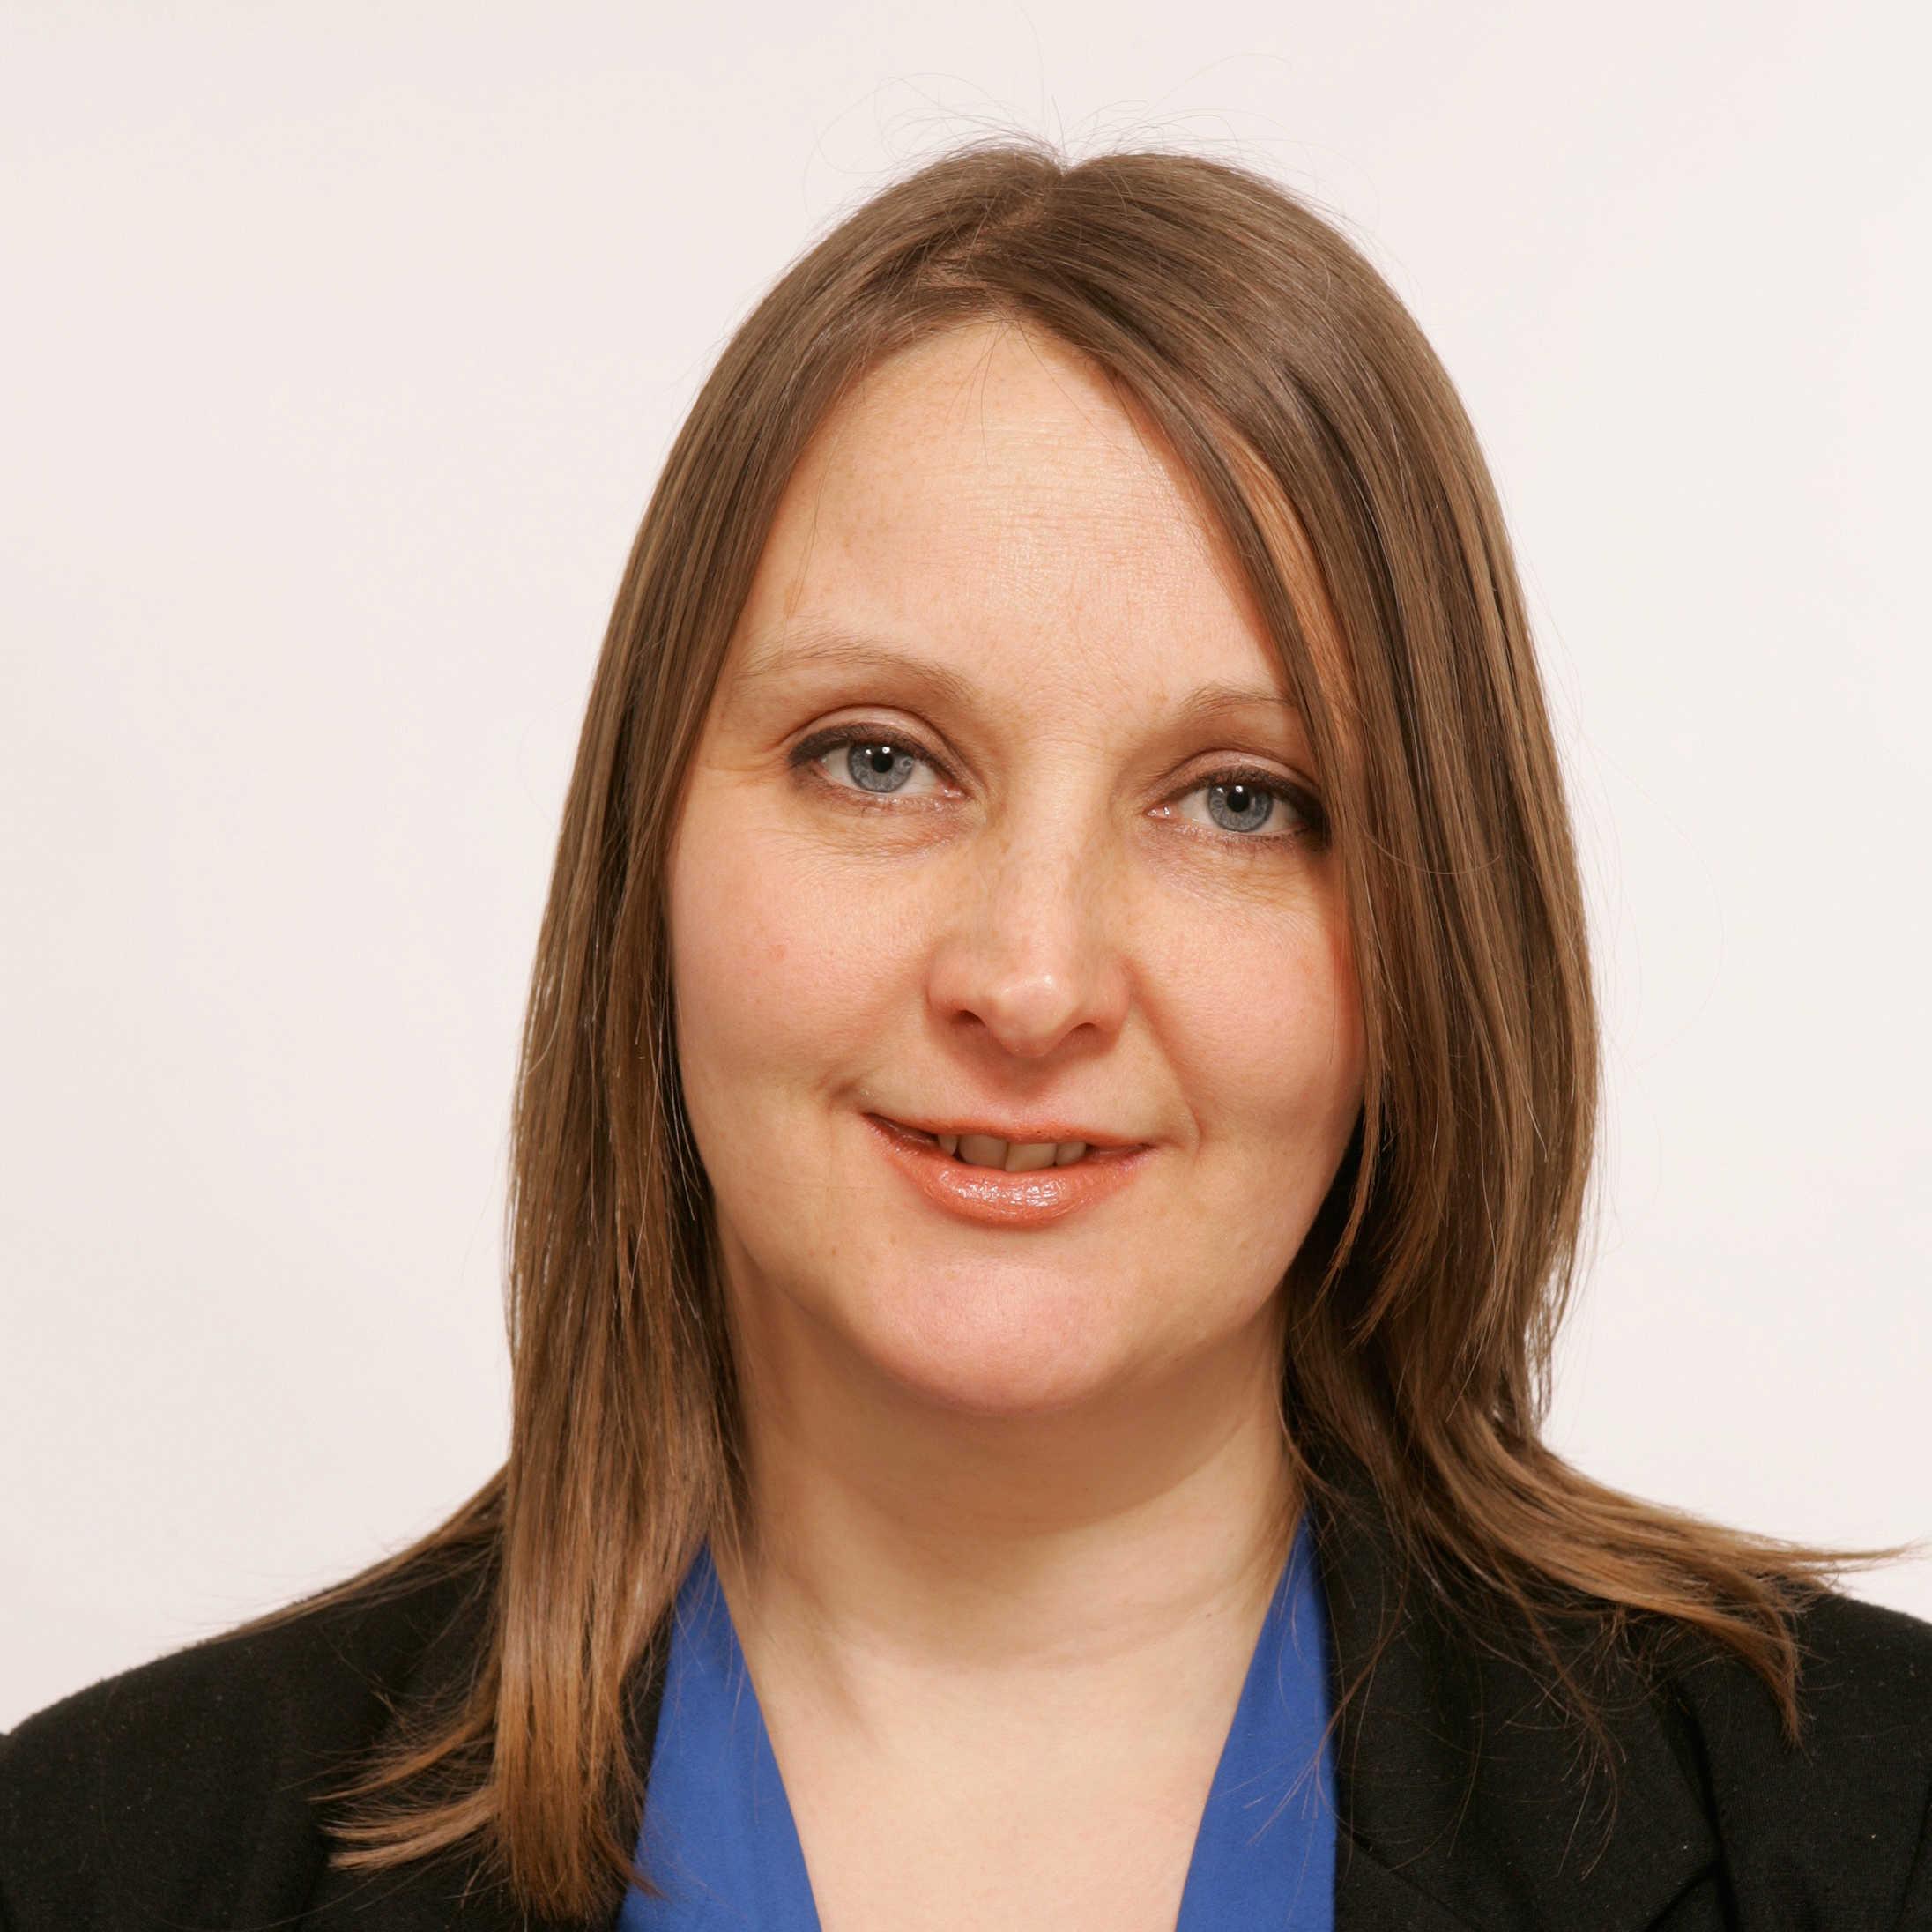 Julie Anderson - Nursery Manager